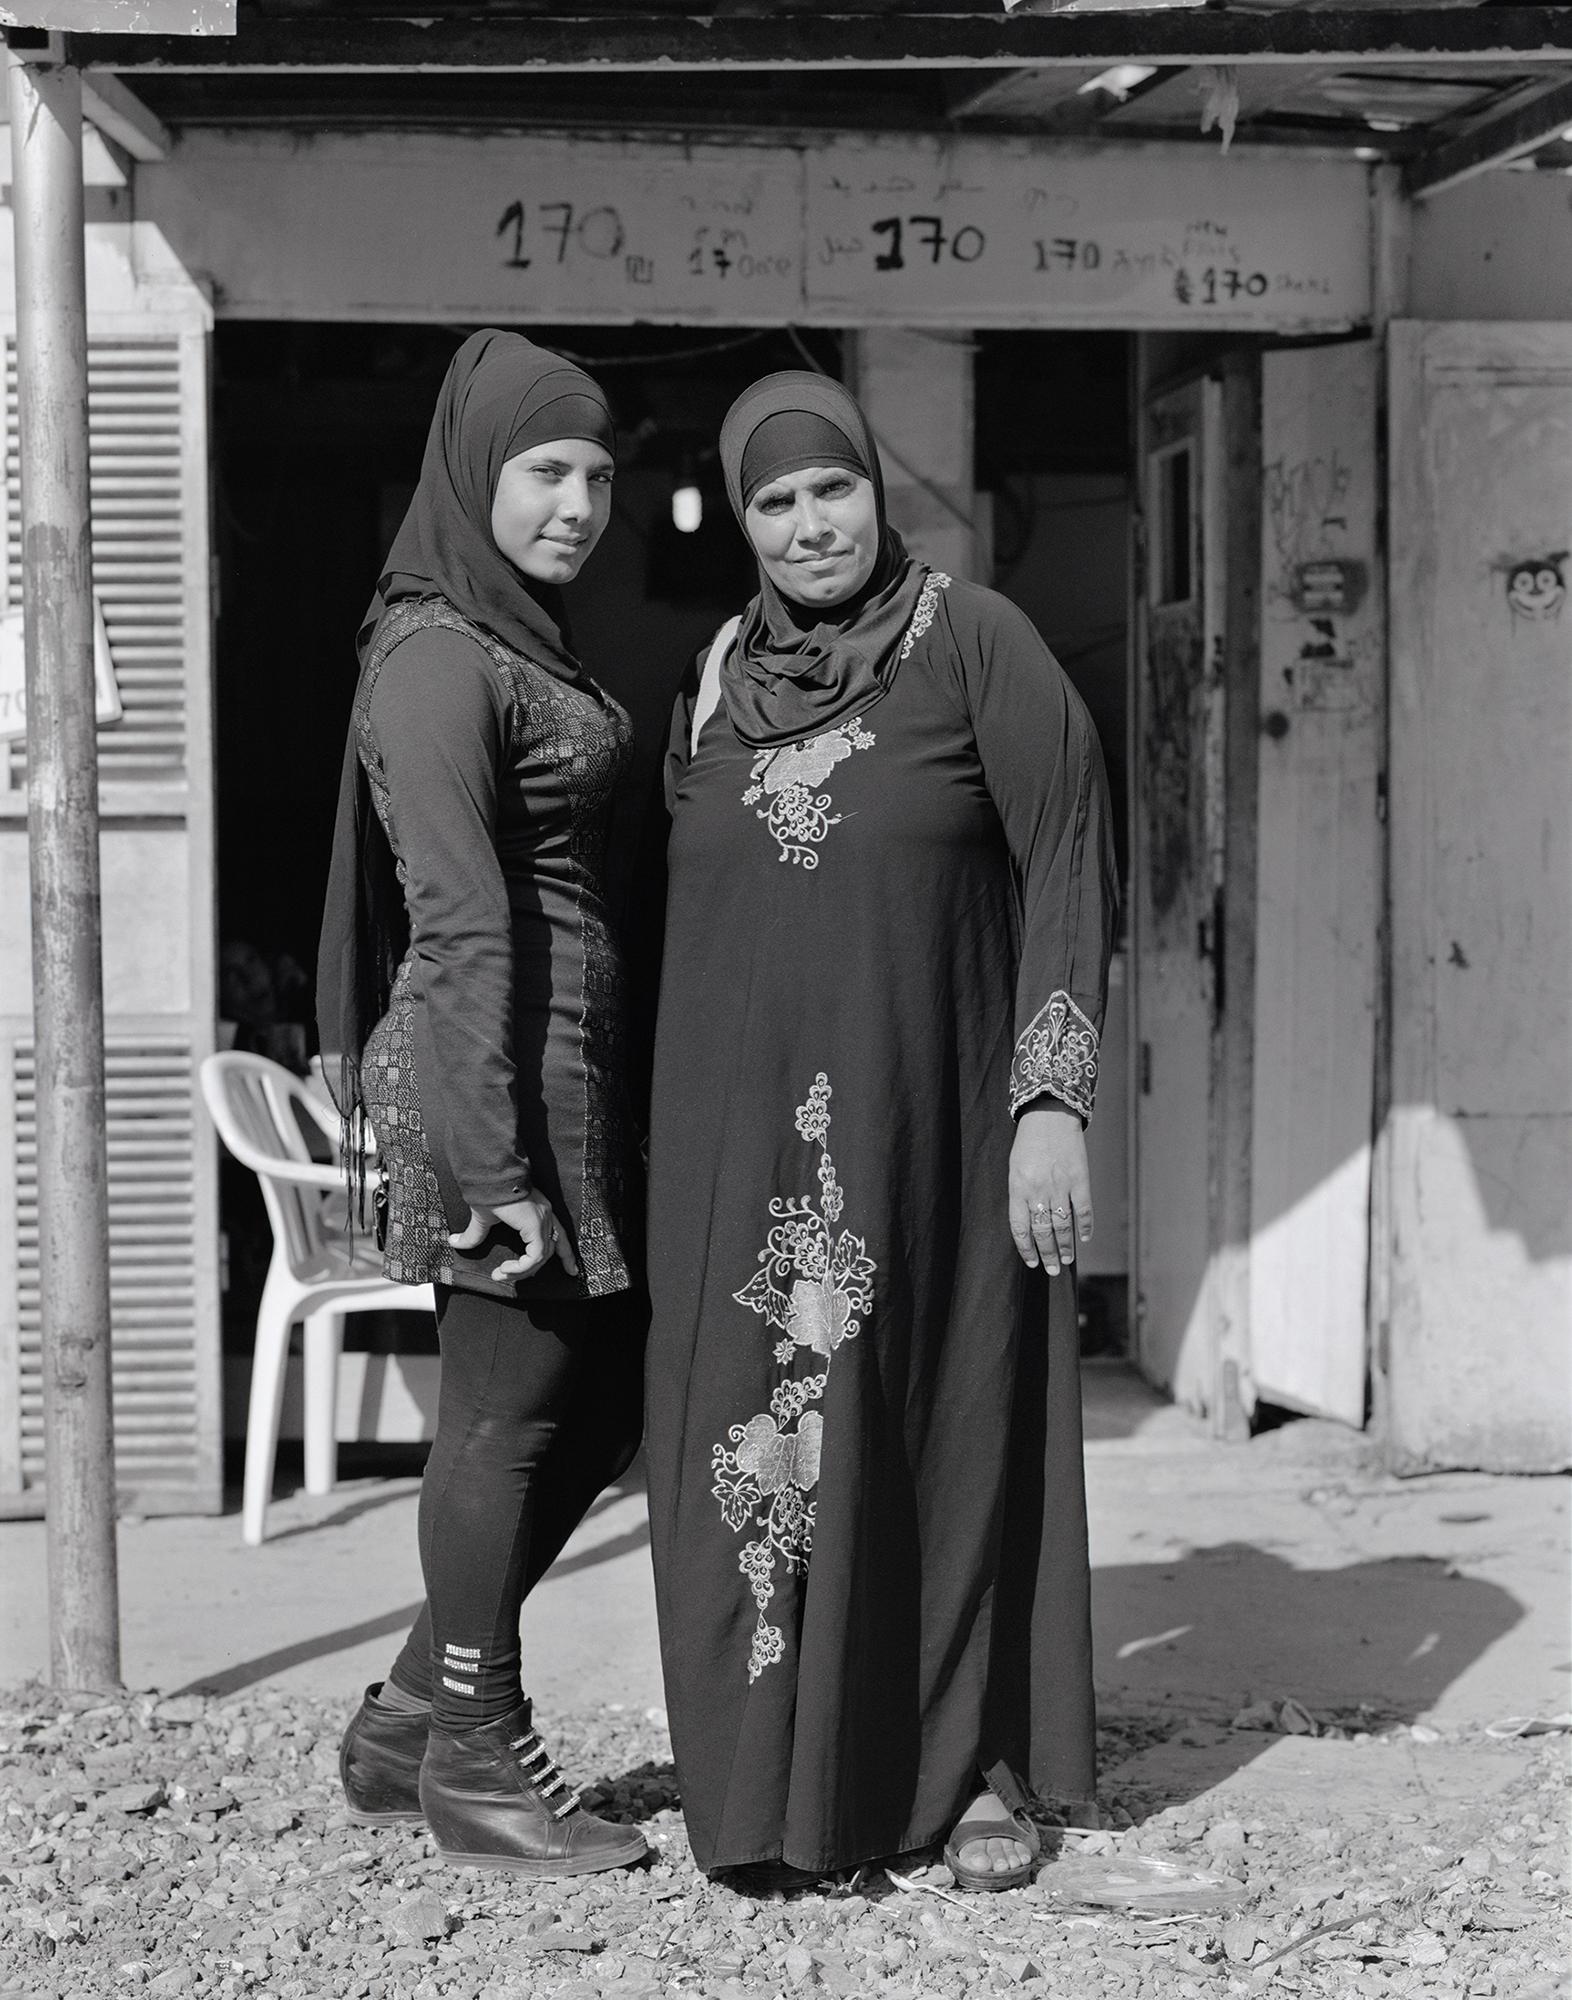 M. and S. (Israel/Palestine), Neve Sha'anan, 2014